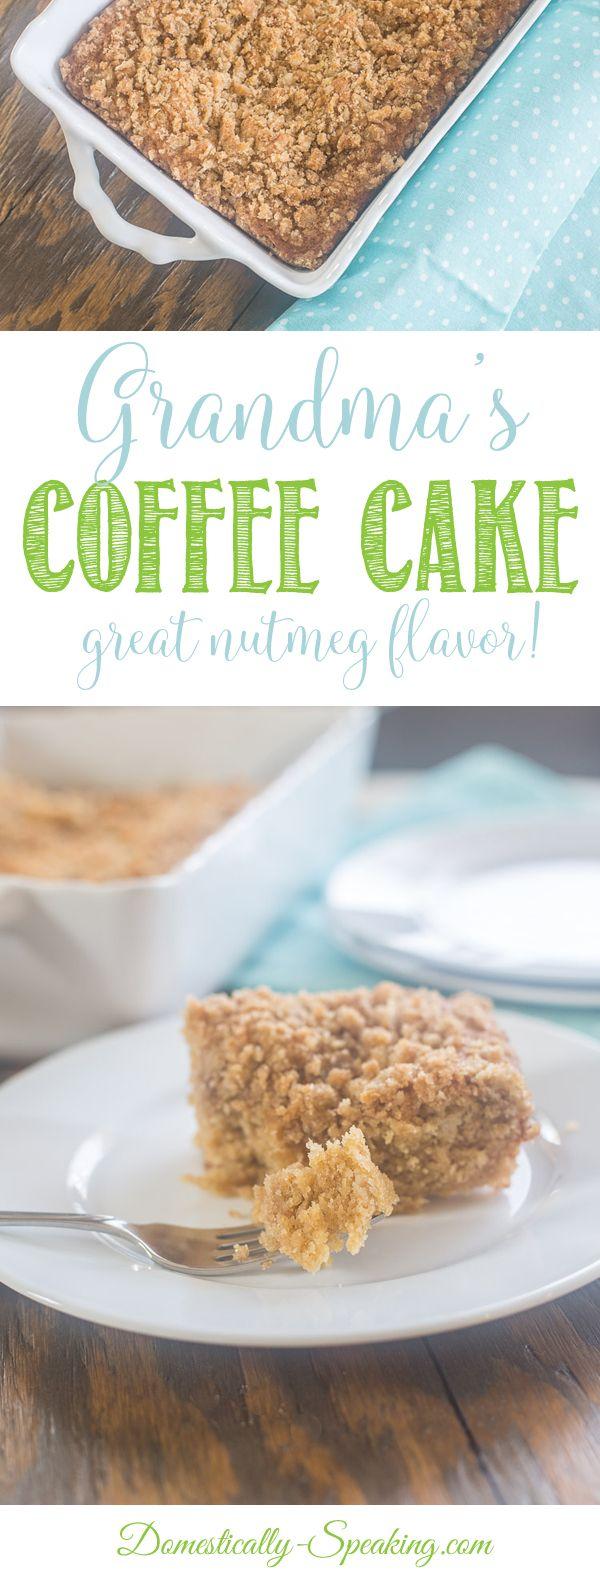 Grandma's Coffee Cake Recipe | Easy Coffee Cake | Nutmeg Coffee Cake perfect with a hot drink